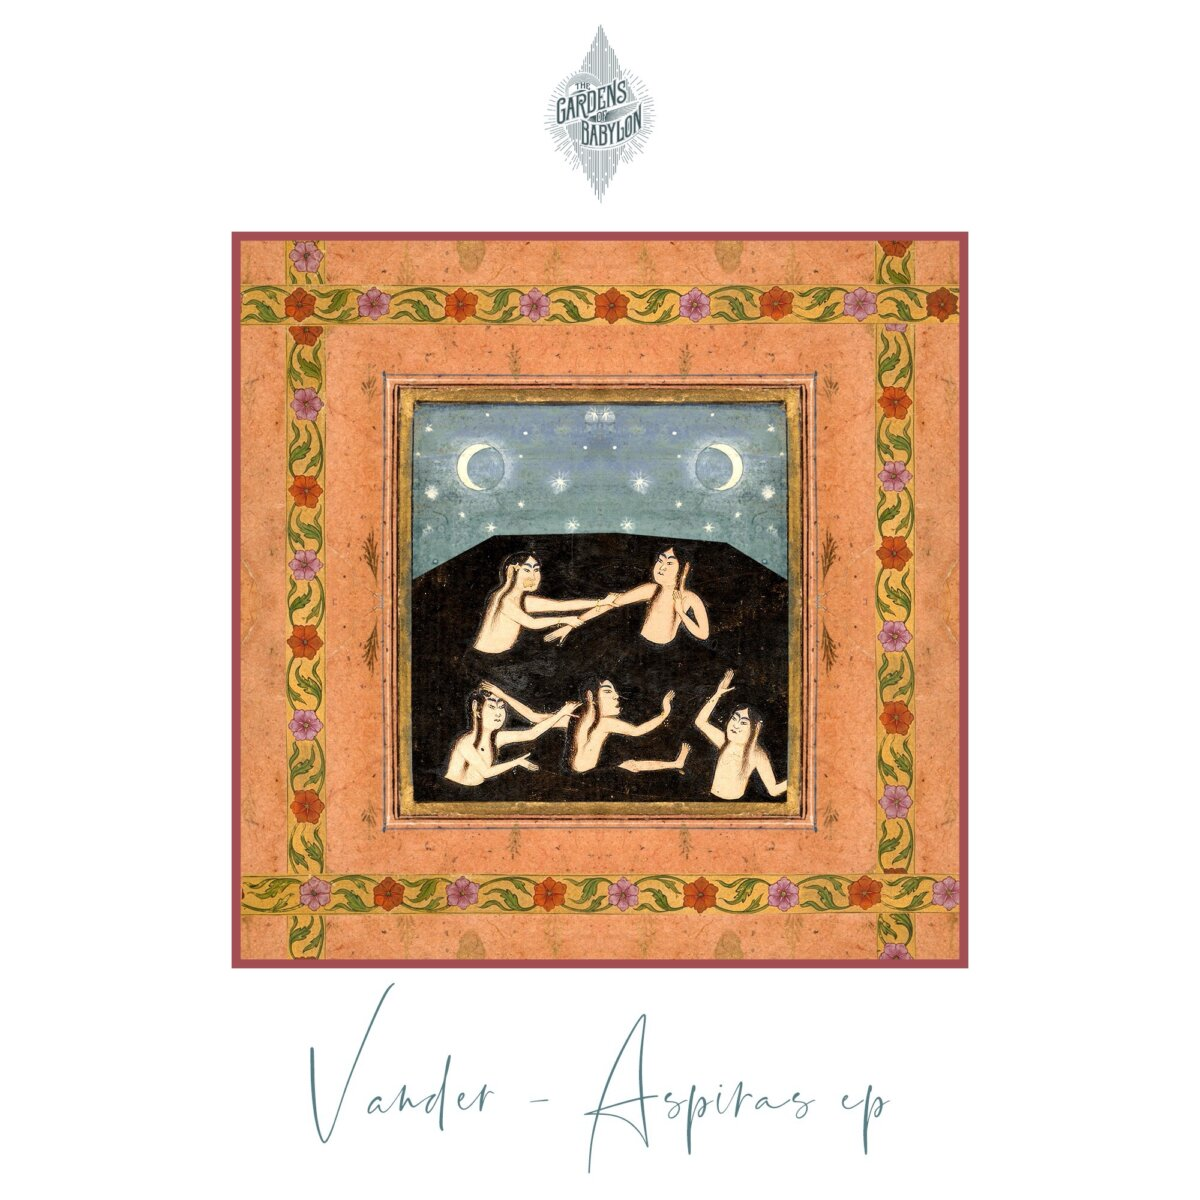 vander, aspiras ep, vander aspiras ep, musical release, the gardens of babylon